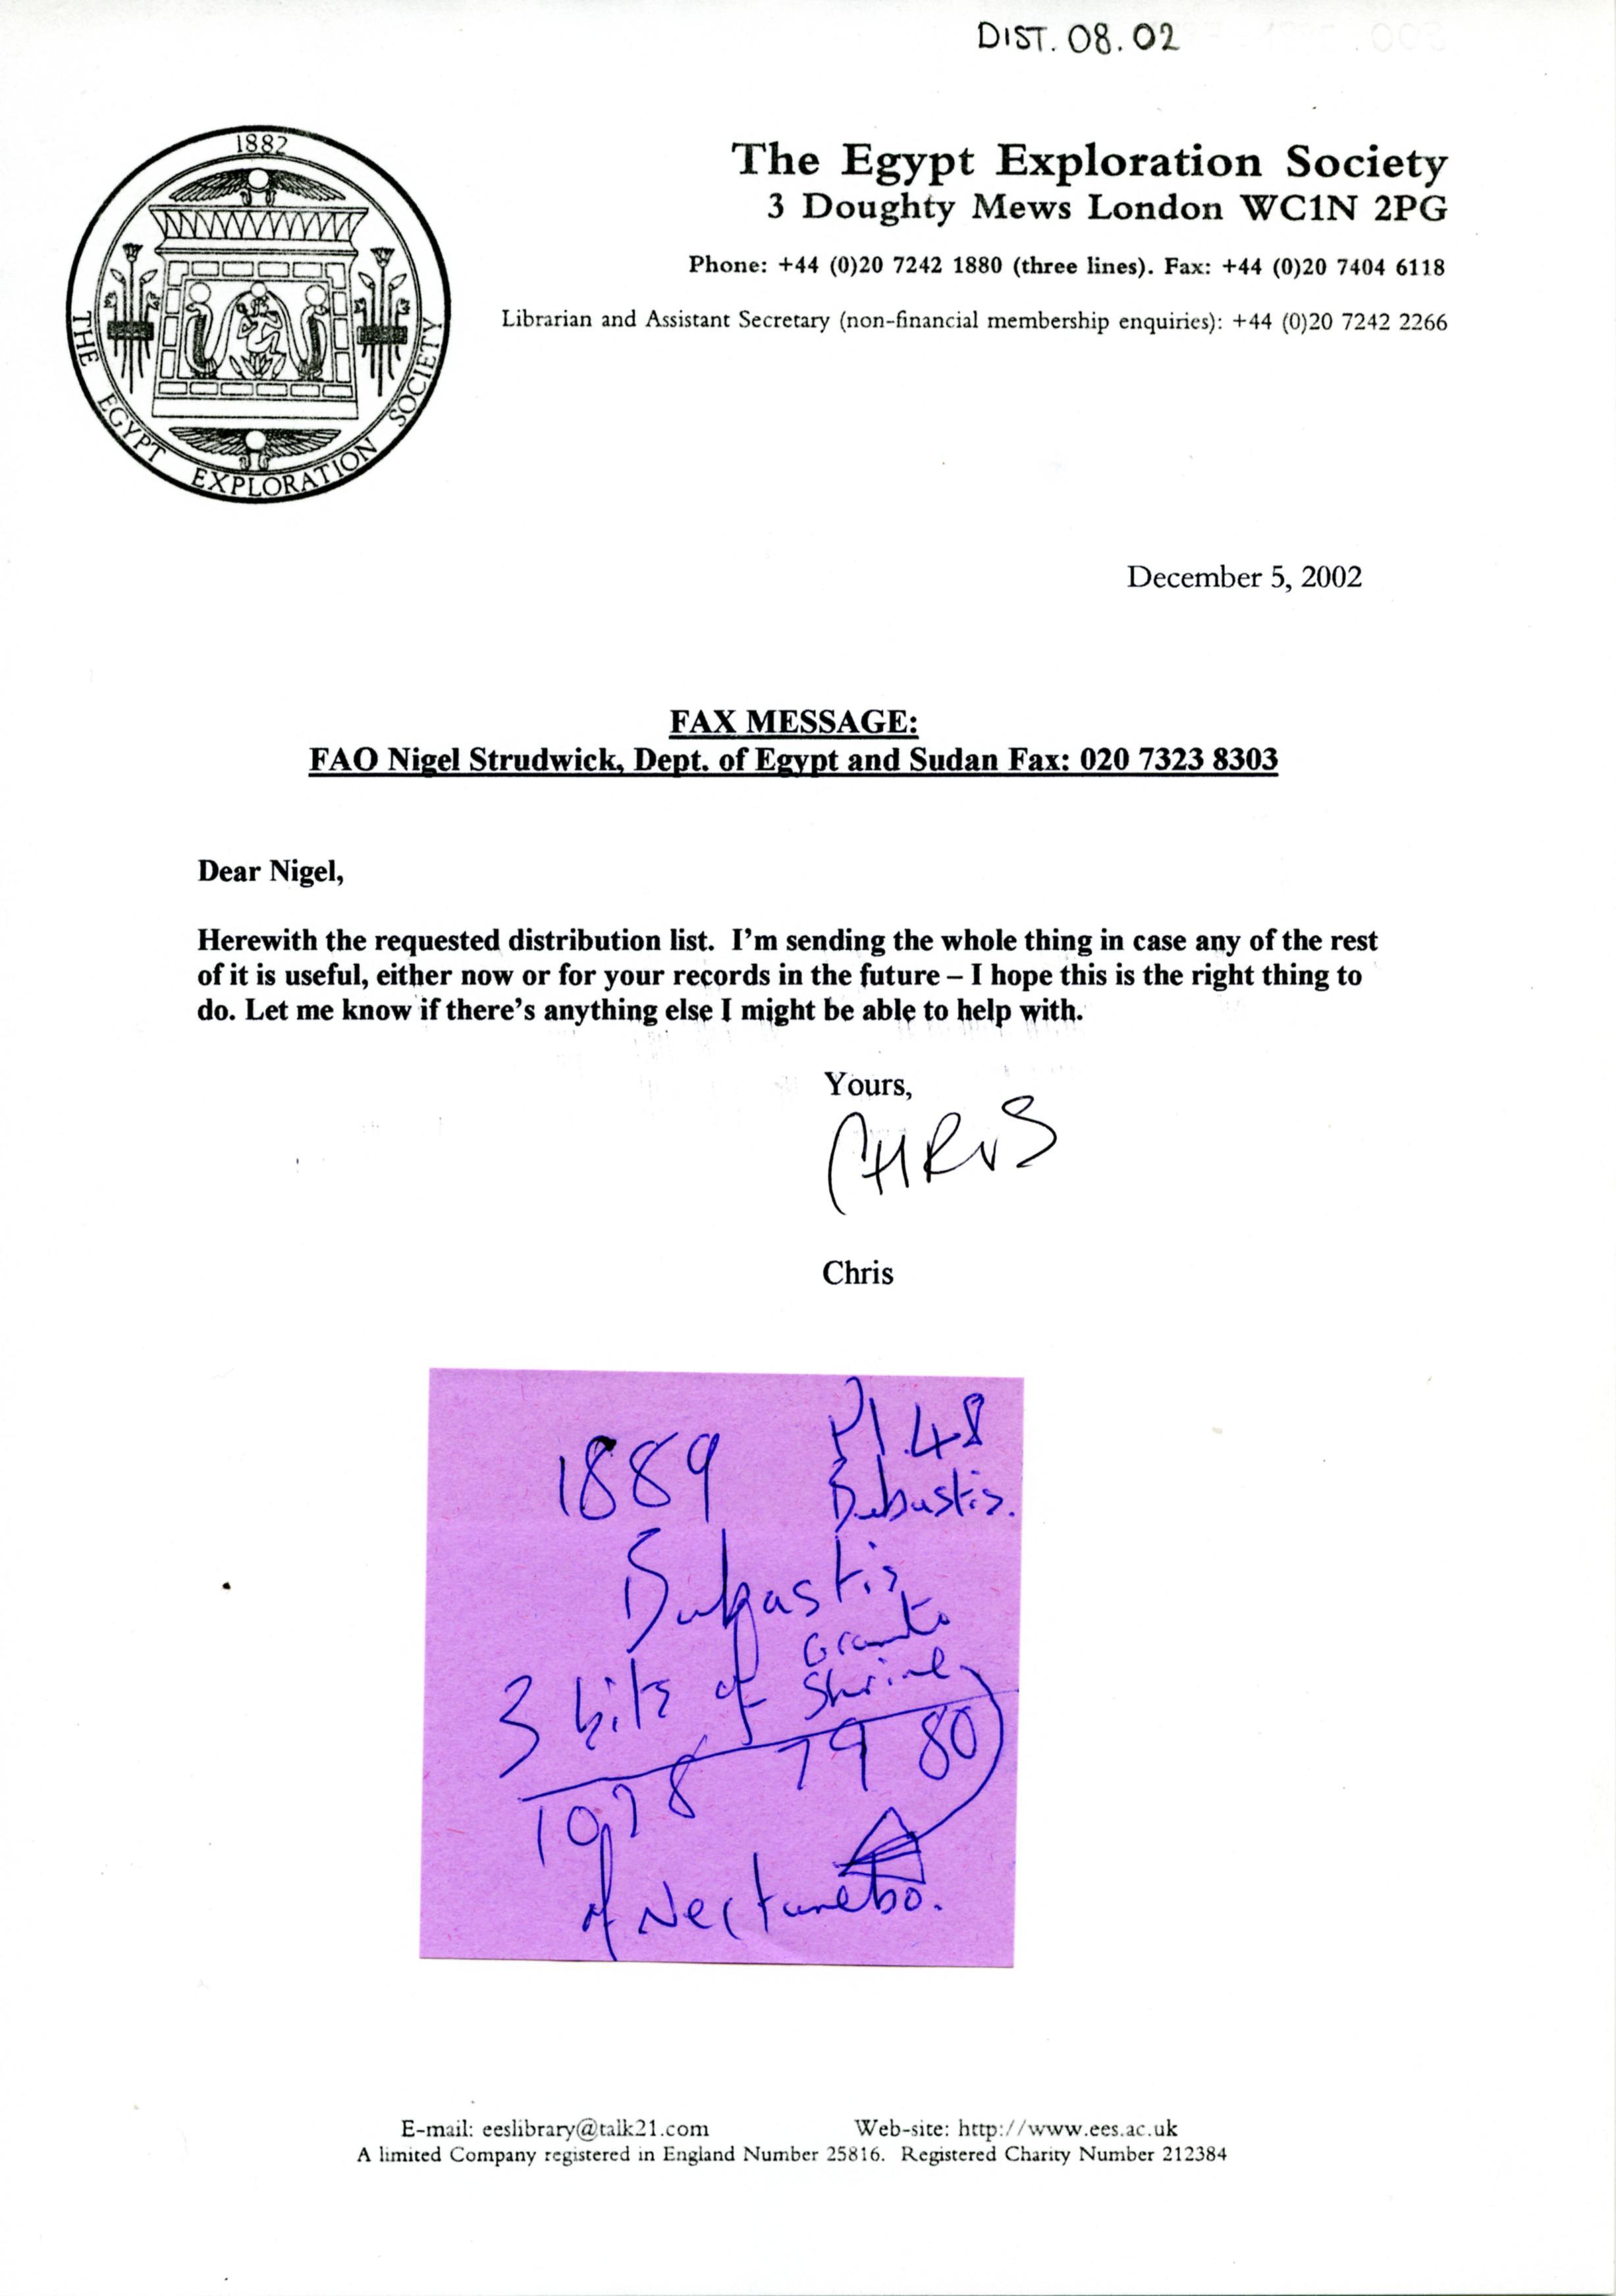 1887, 1888, 1889, 1889-90 Bubastis Correspondence DIST.08.02